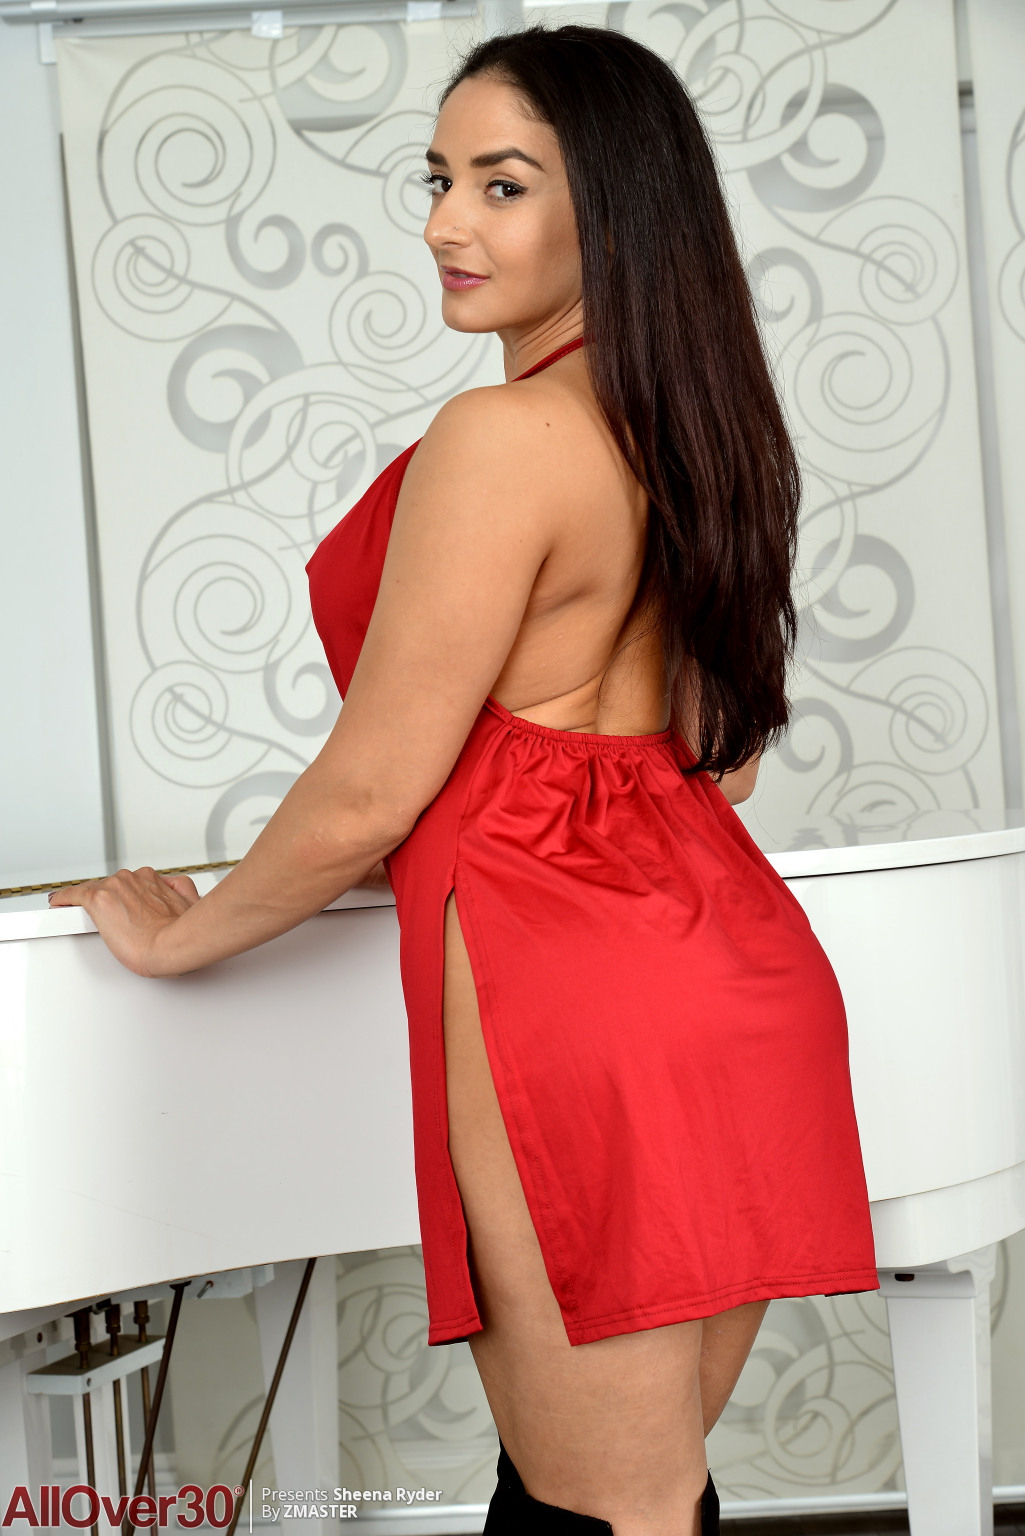 Sheena Ryder from AllOver30